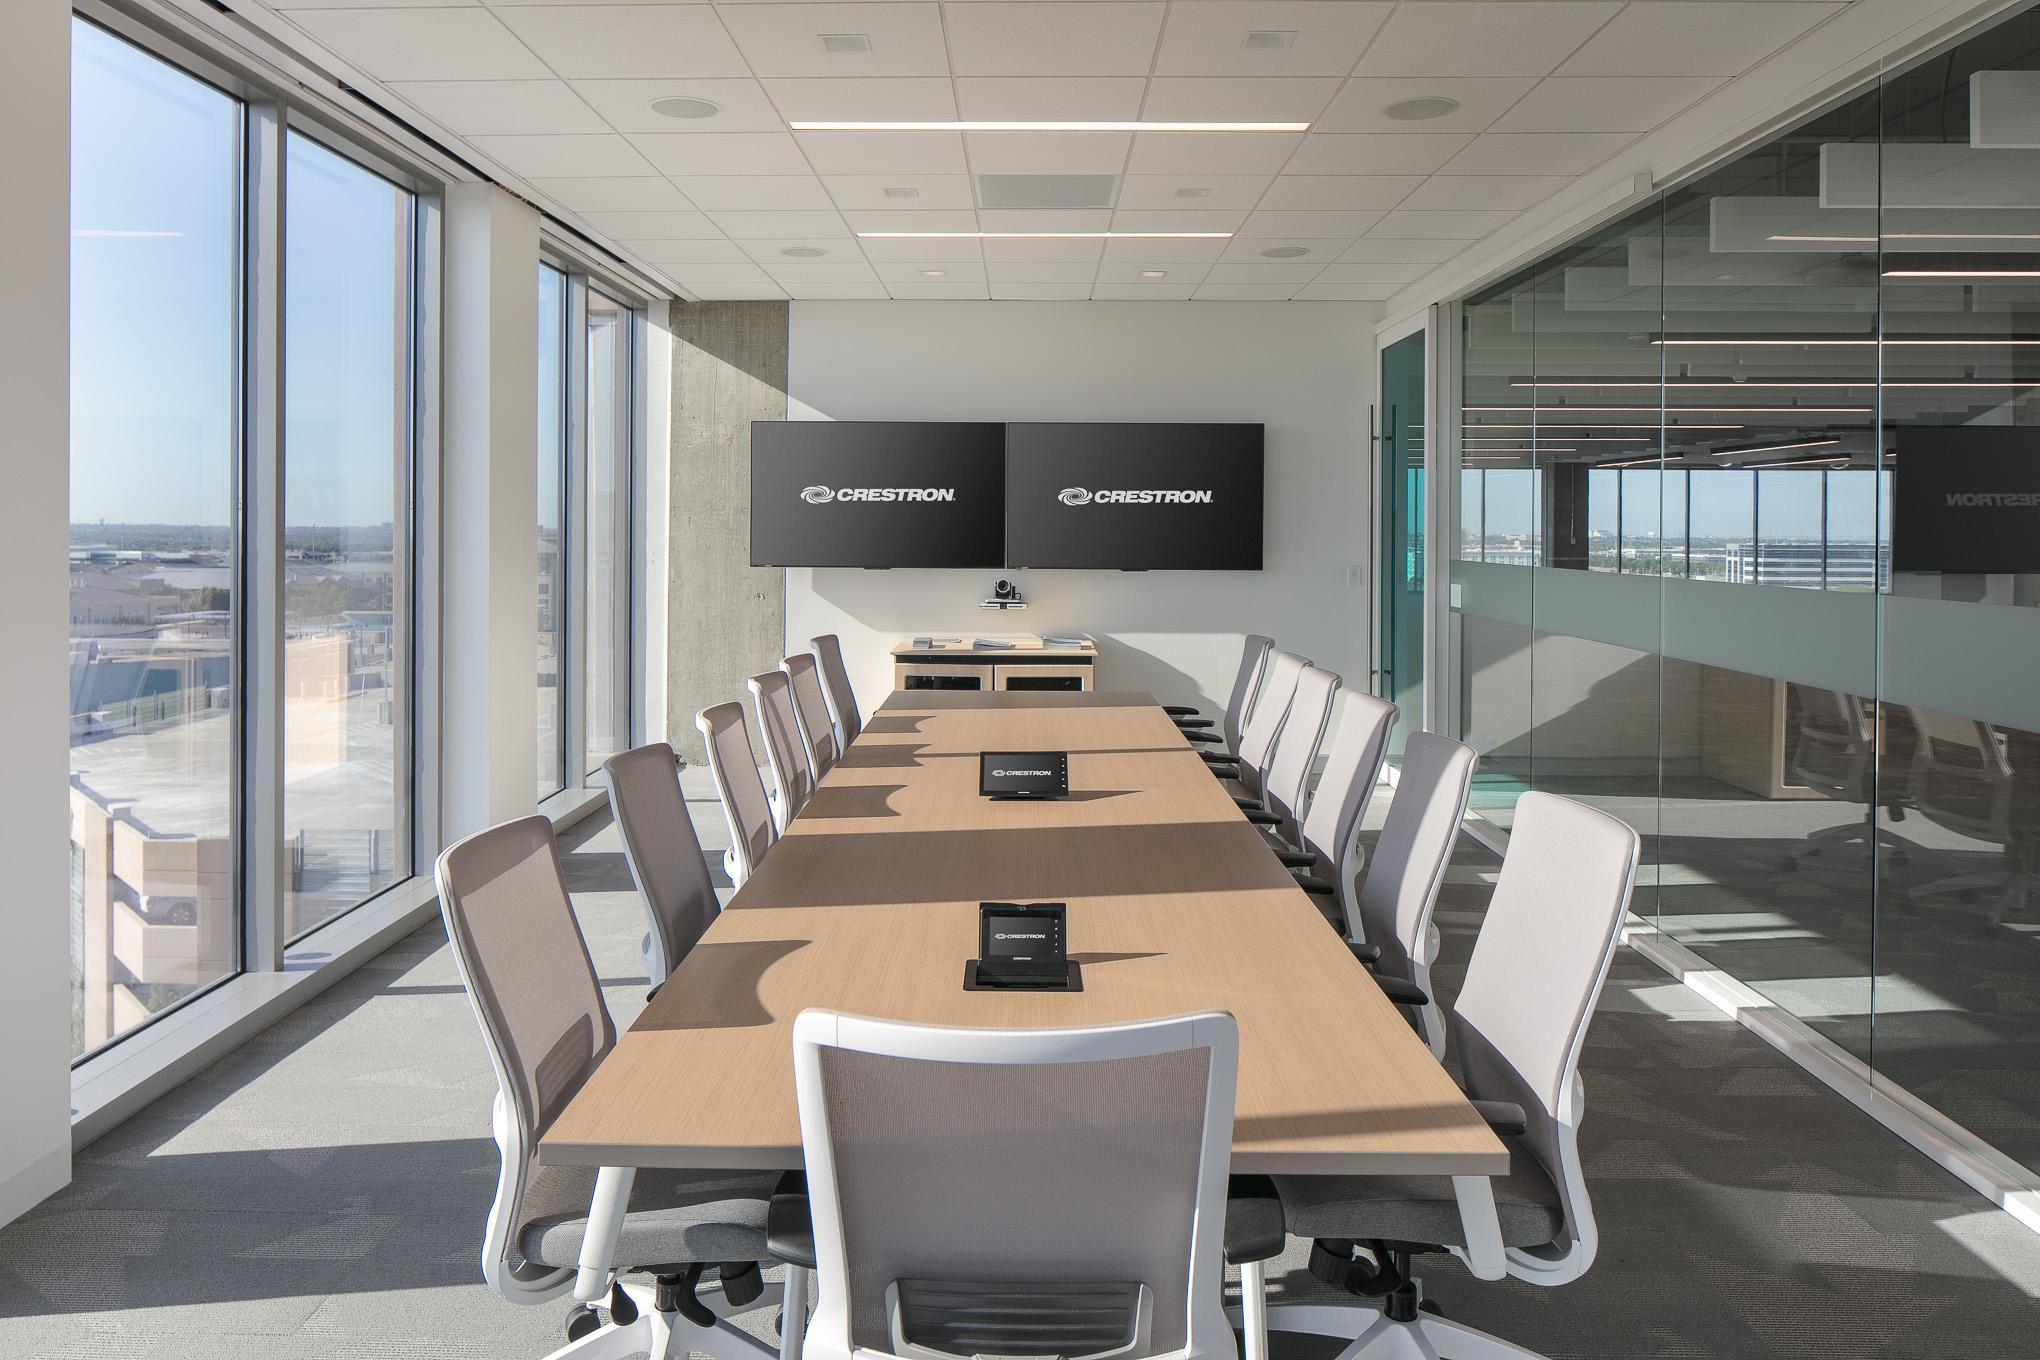 Crestron Headquarters - Plano, TX - Gensler